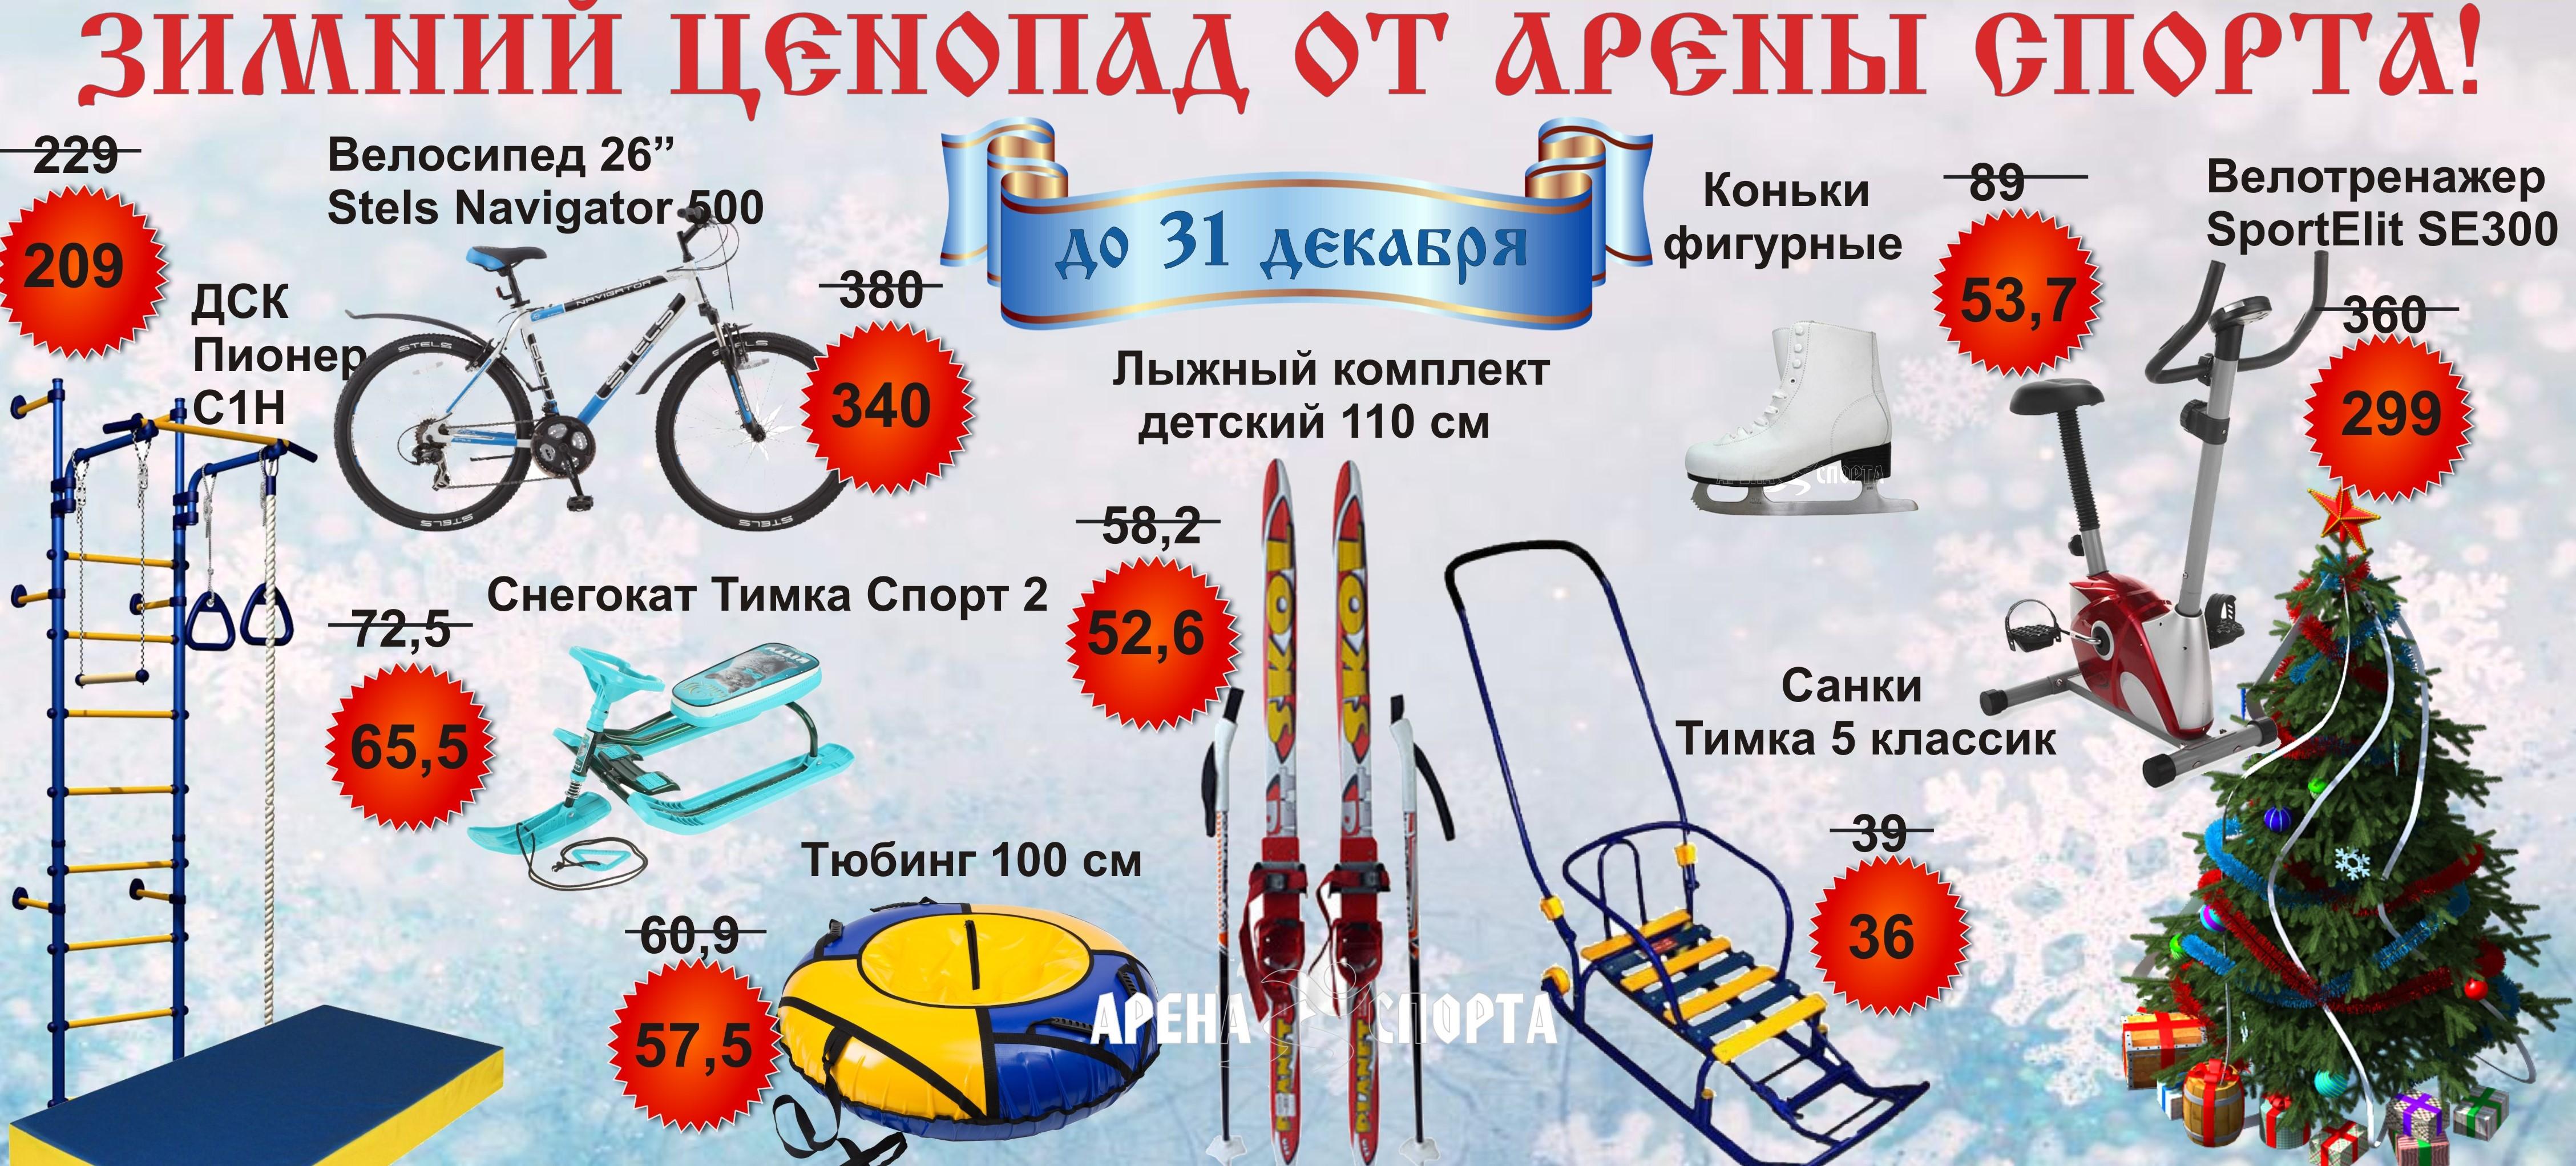 http://arena-sporta.by/catalog/zimniy-assortiment/sanki